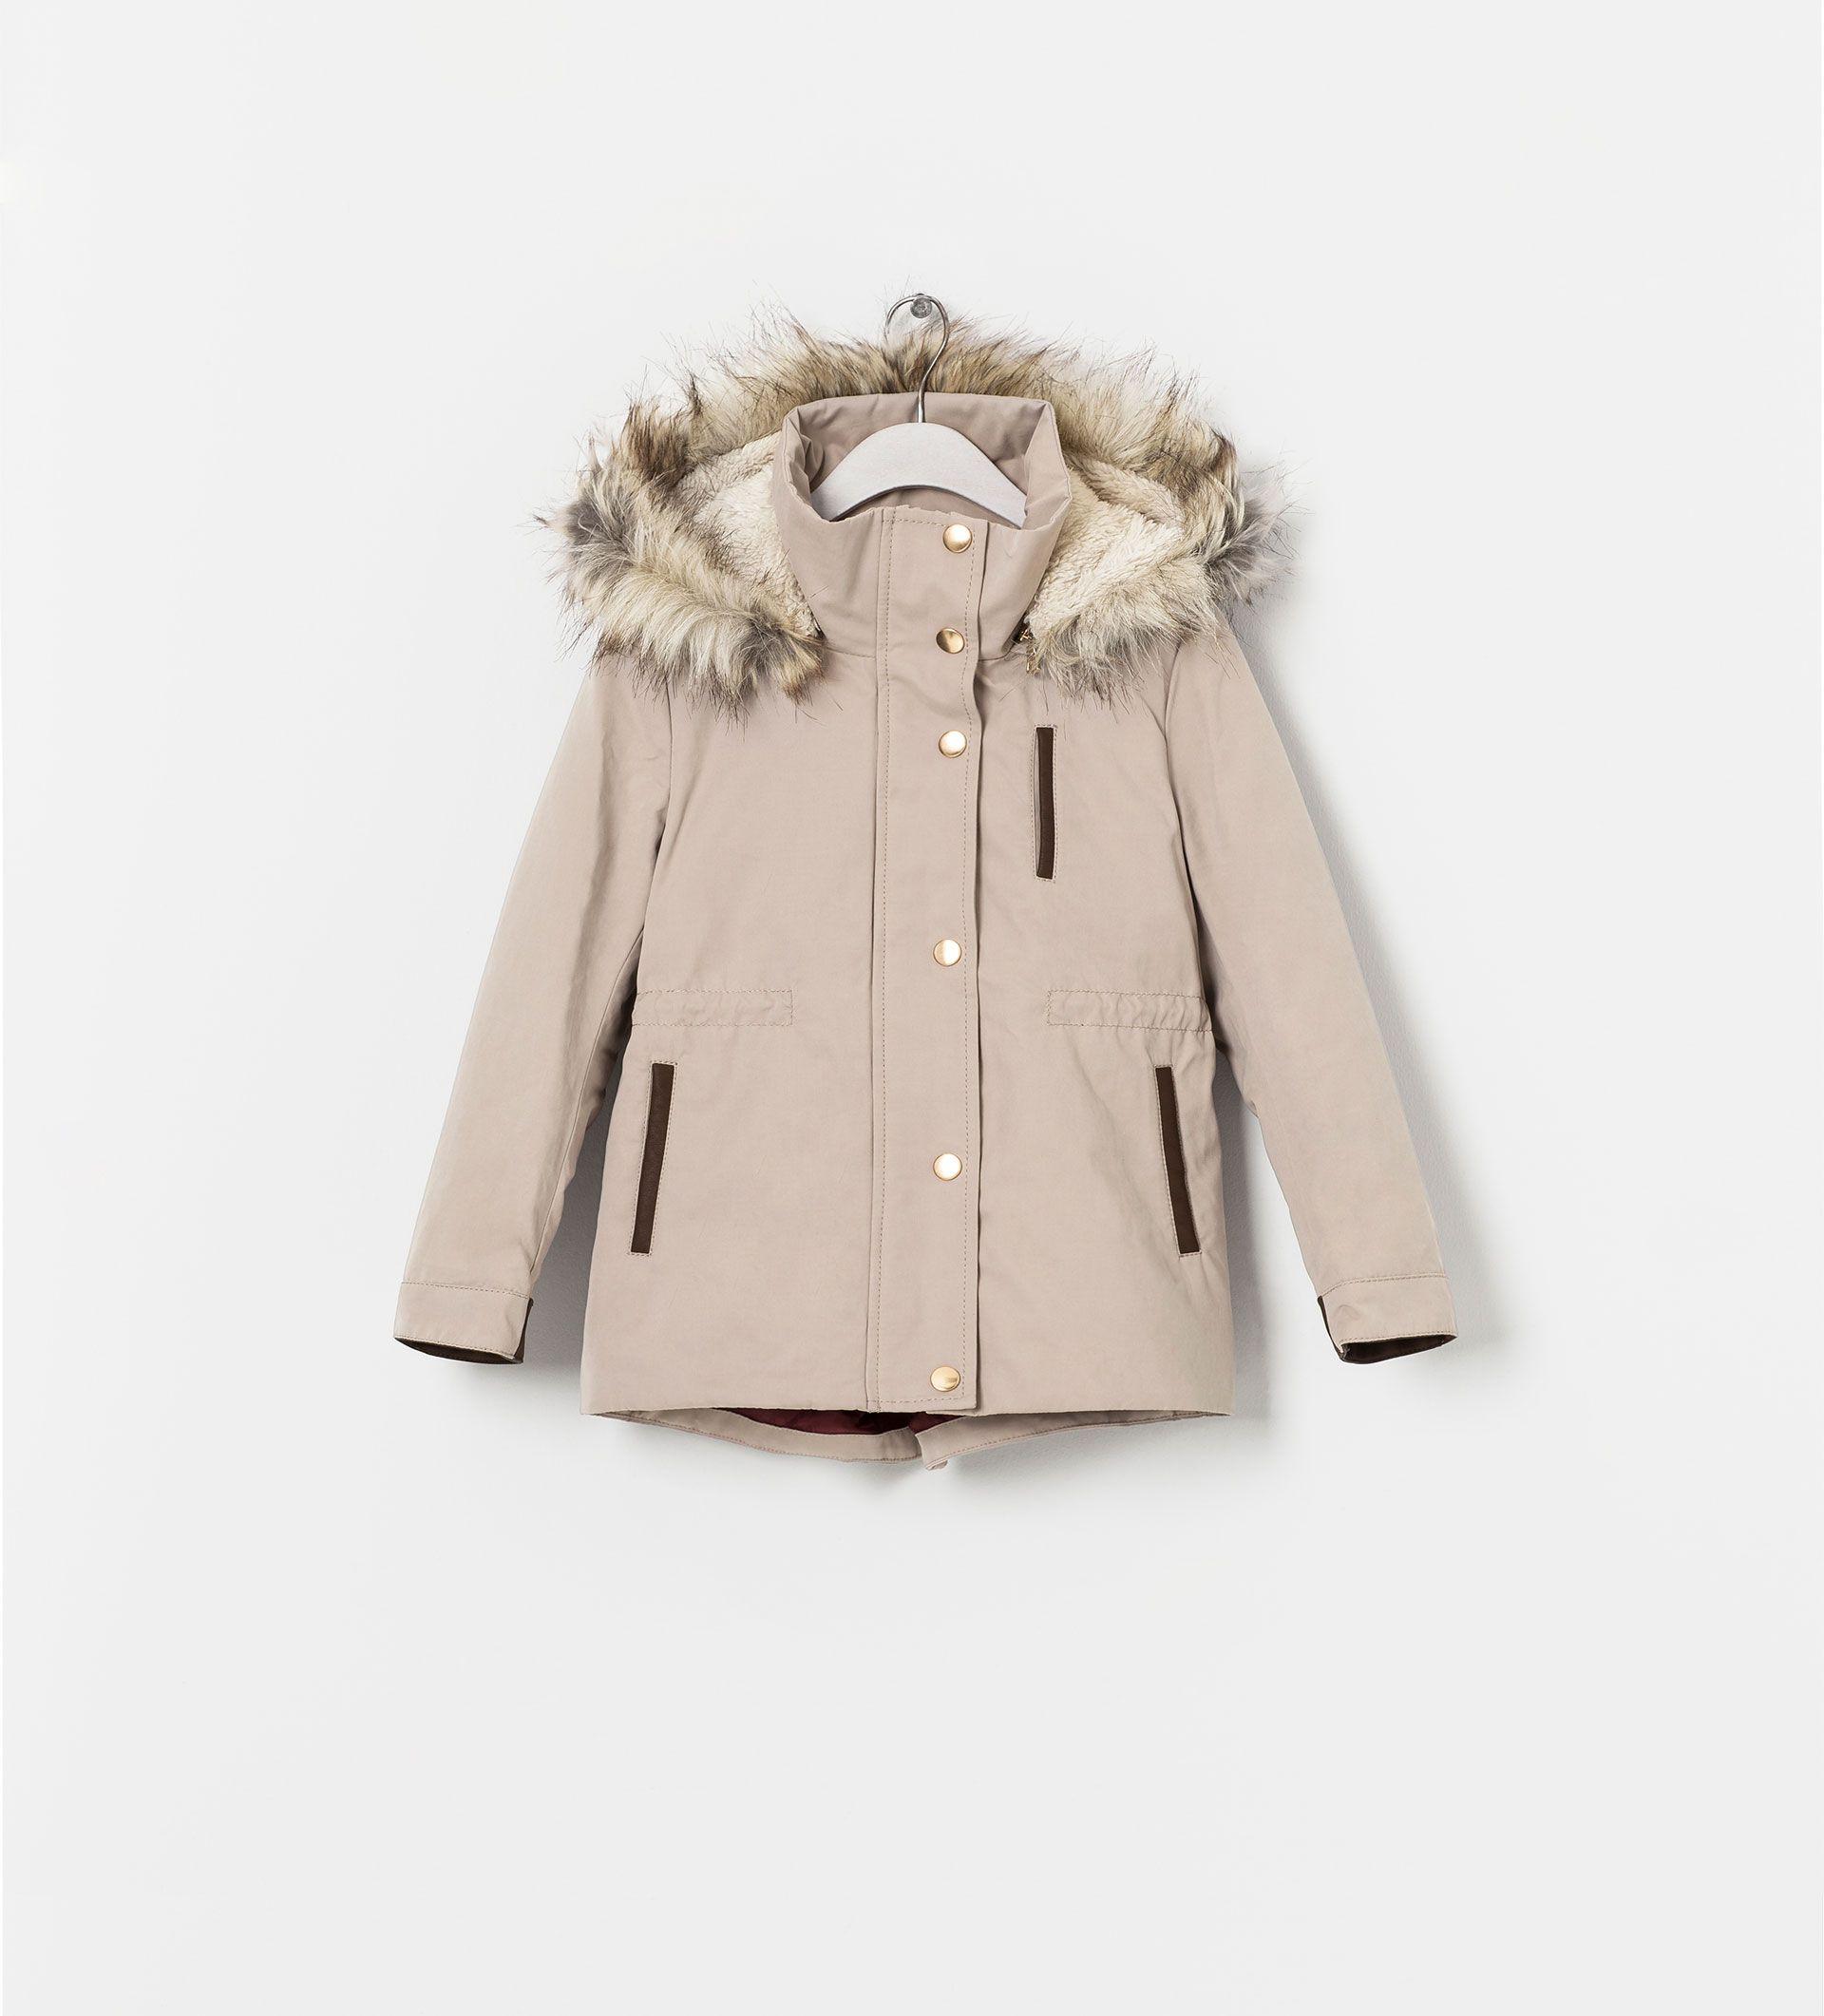 Zara Girls Kurtka Parka Bezowa Z Misiem 13 14 Lat Zara Coat Coat Zara Kids